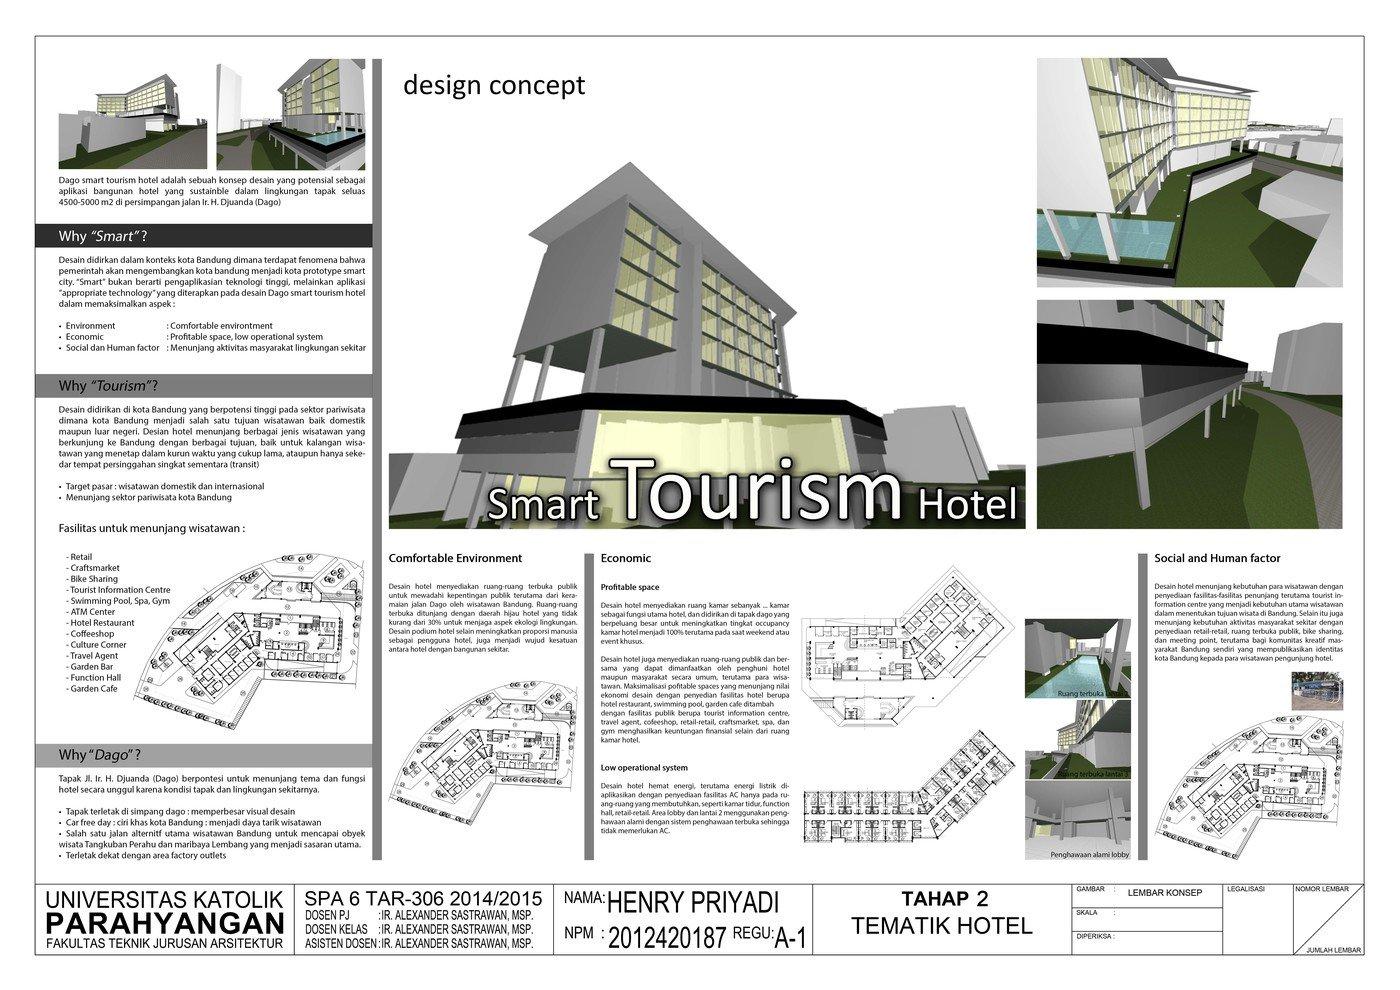 Dago smart tourism hotel by pius henry priyadi at coroflot ccuart Images